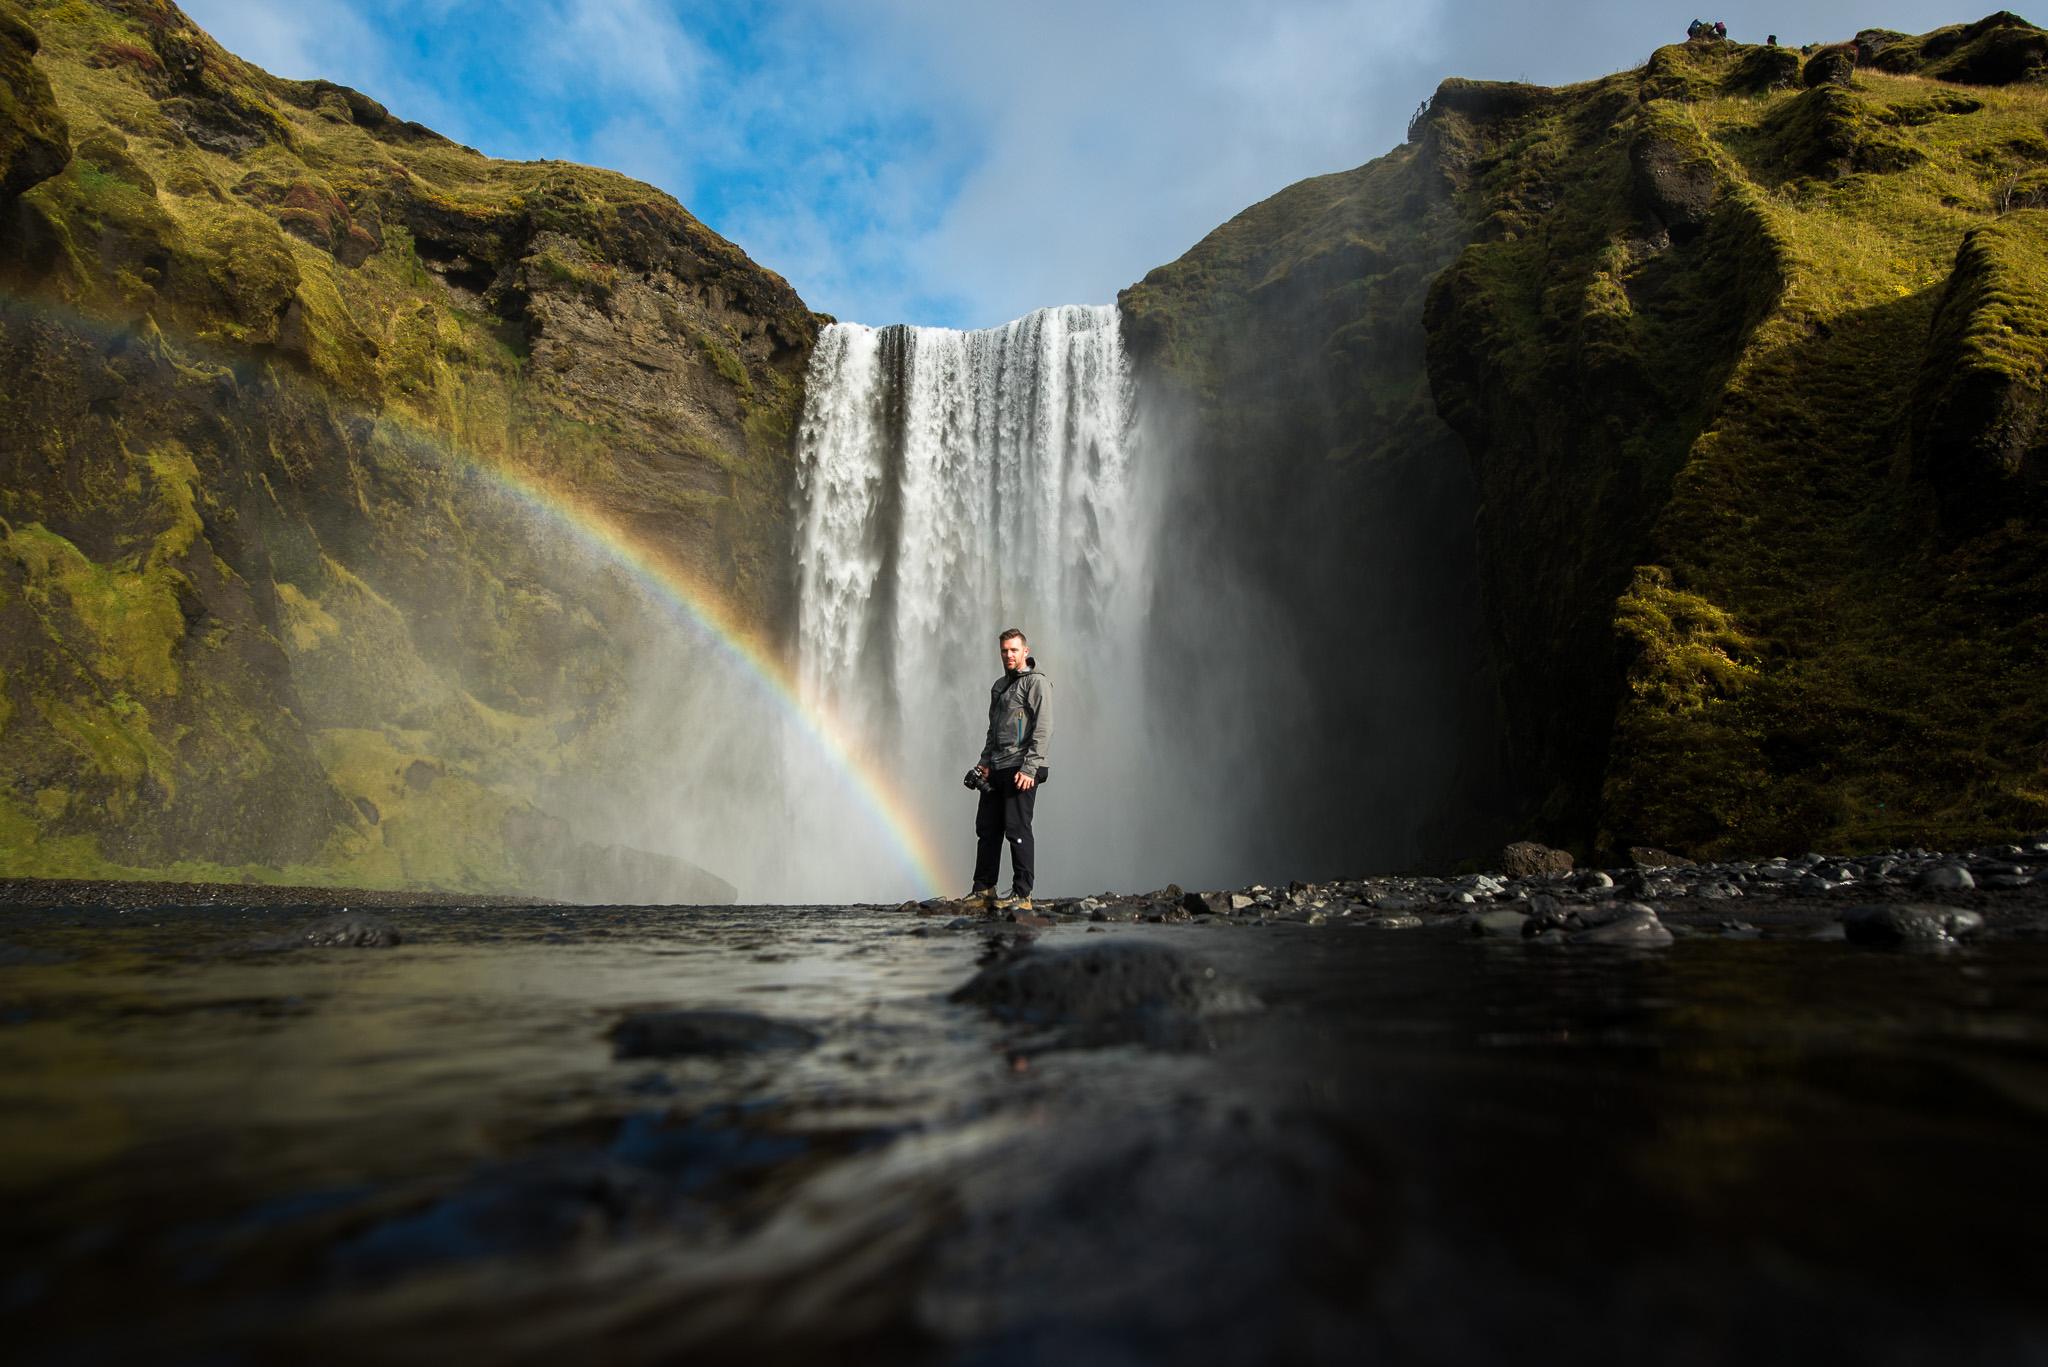 Matt at the end of a rainbow, at the bottom of Skogafoss.